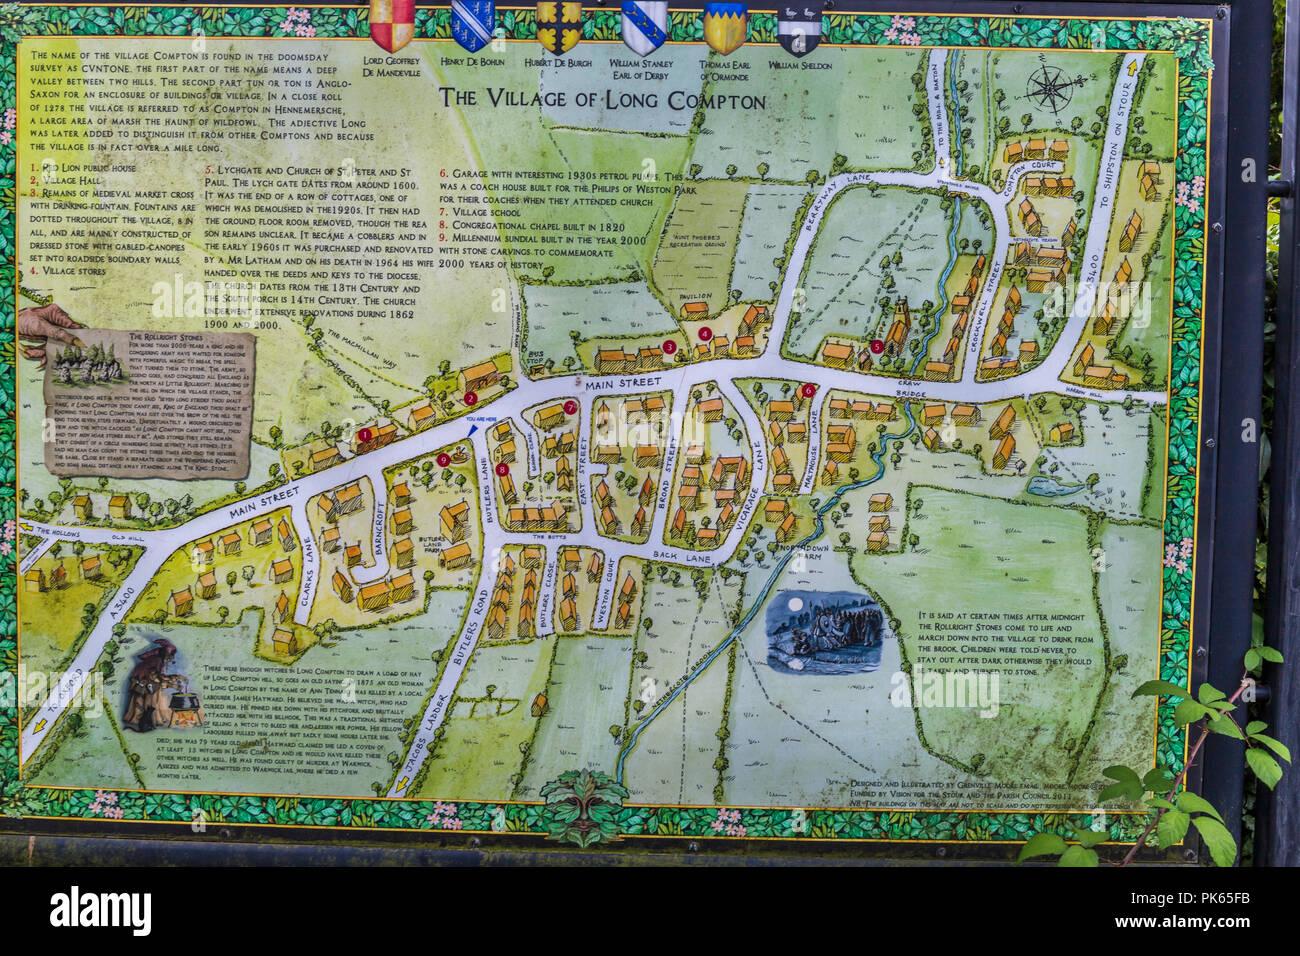 Village Map, Long Compton - Stock Image